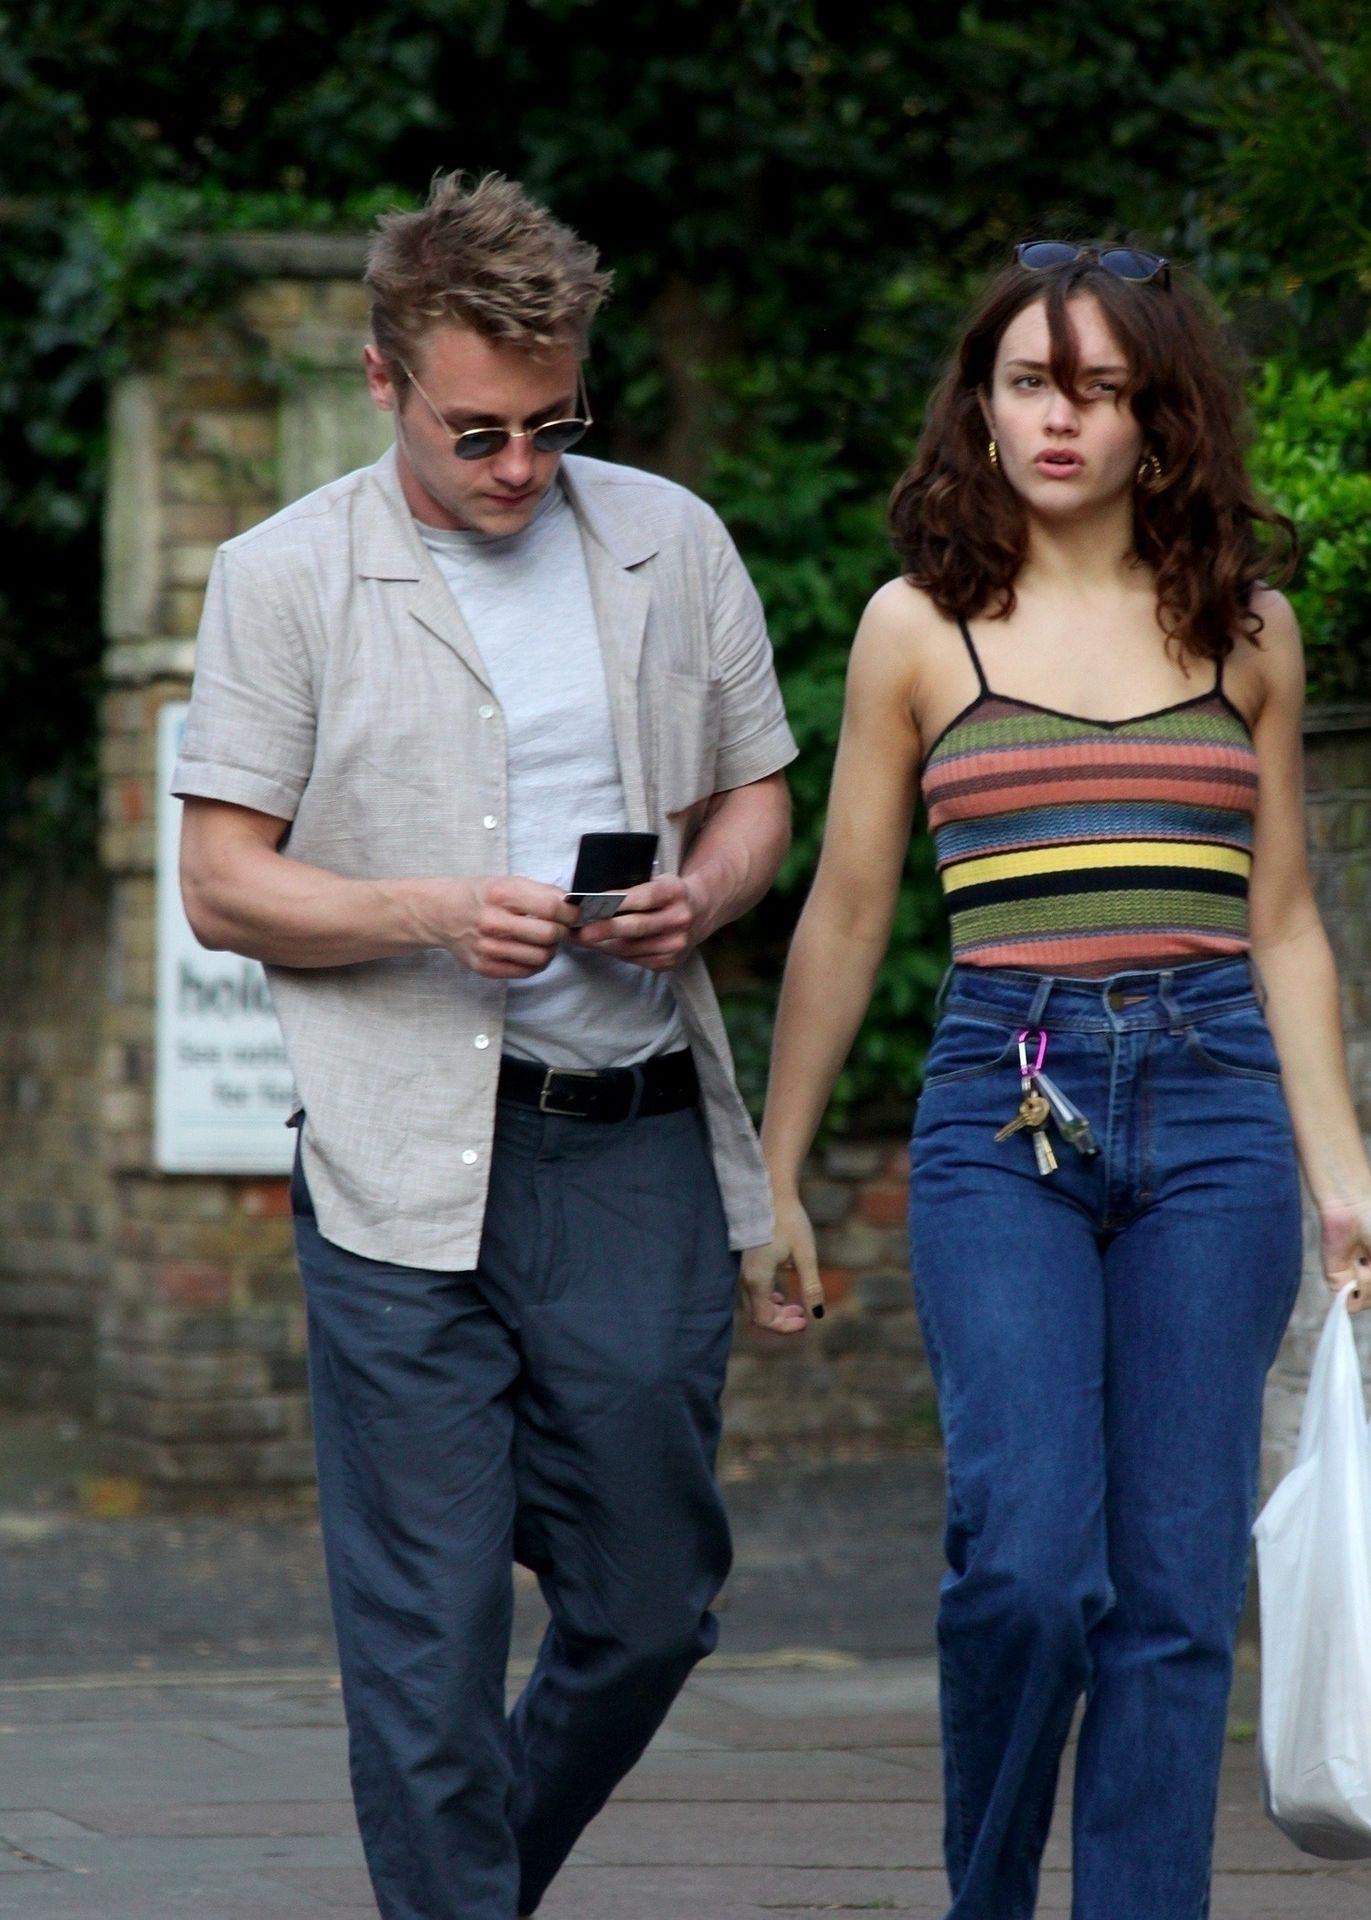 Ben Hardy Walks Hand In Hand With Actress Girlfriend Olivia Cooke 0008